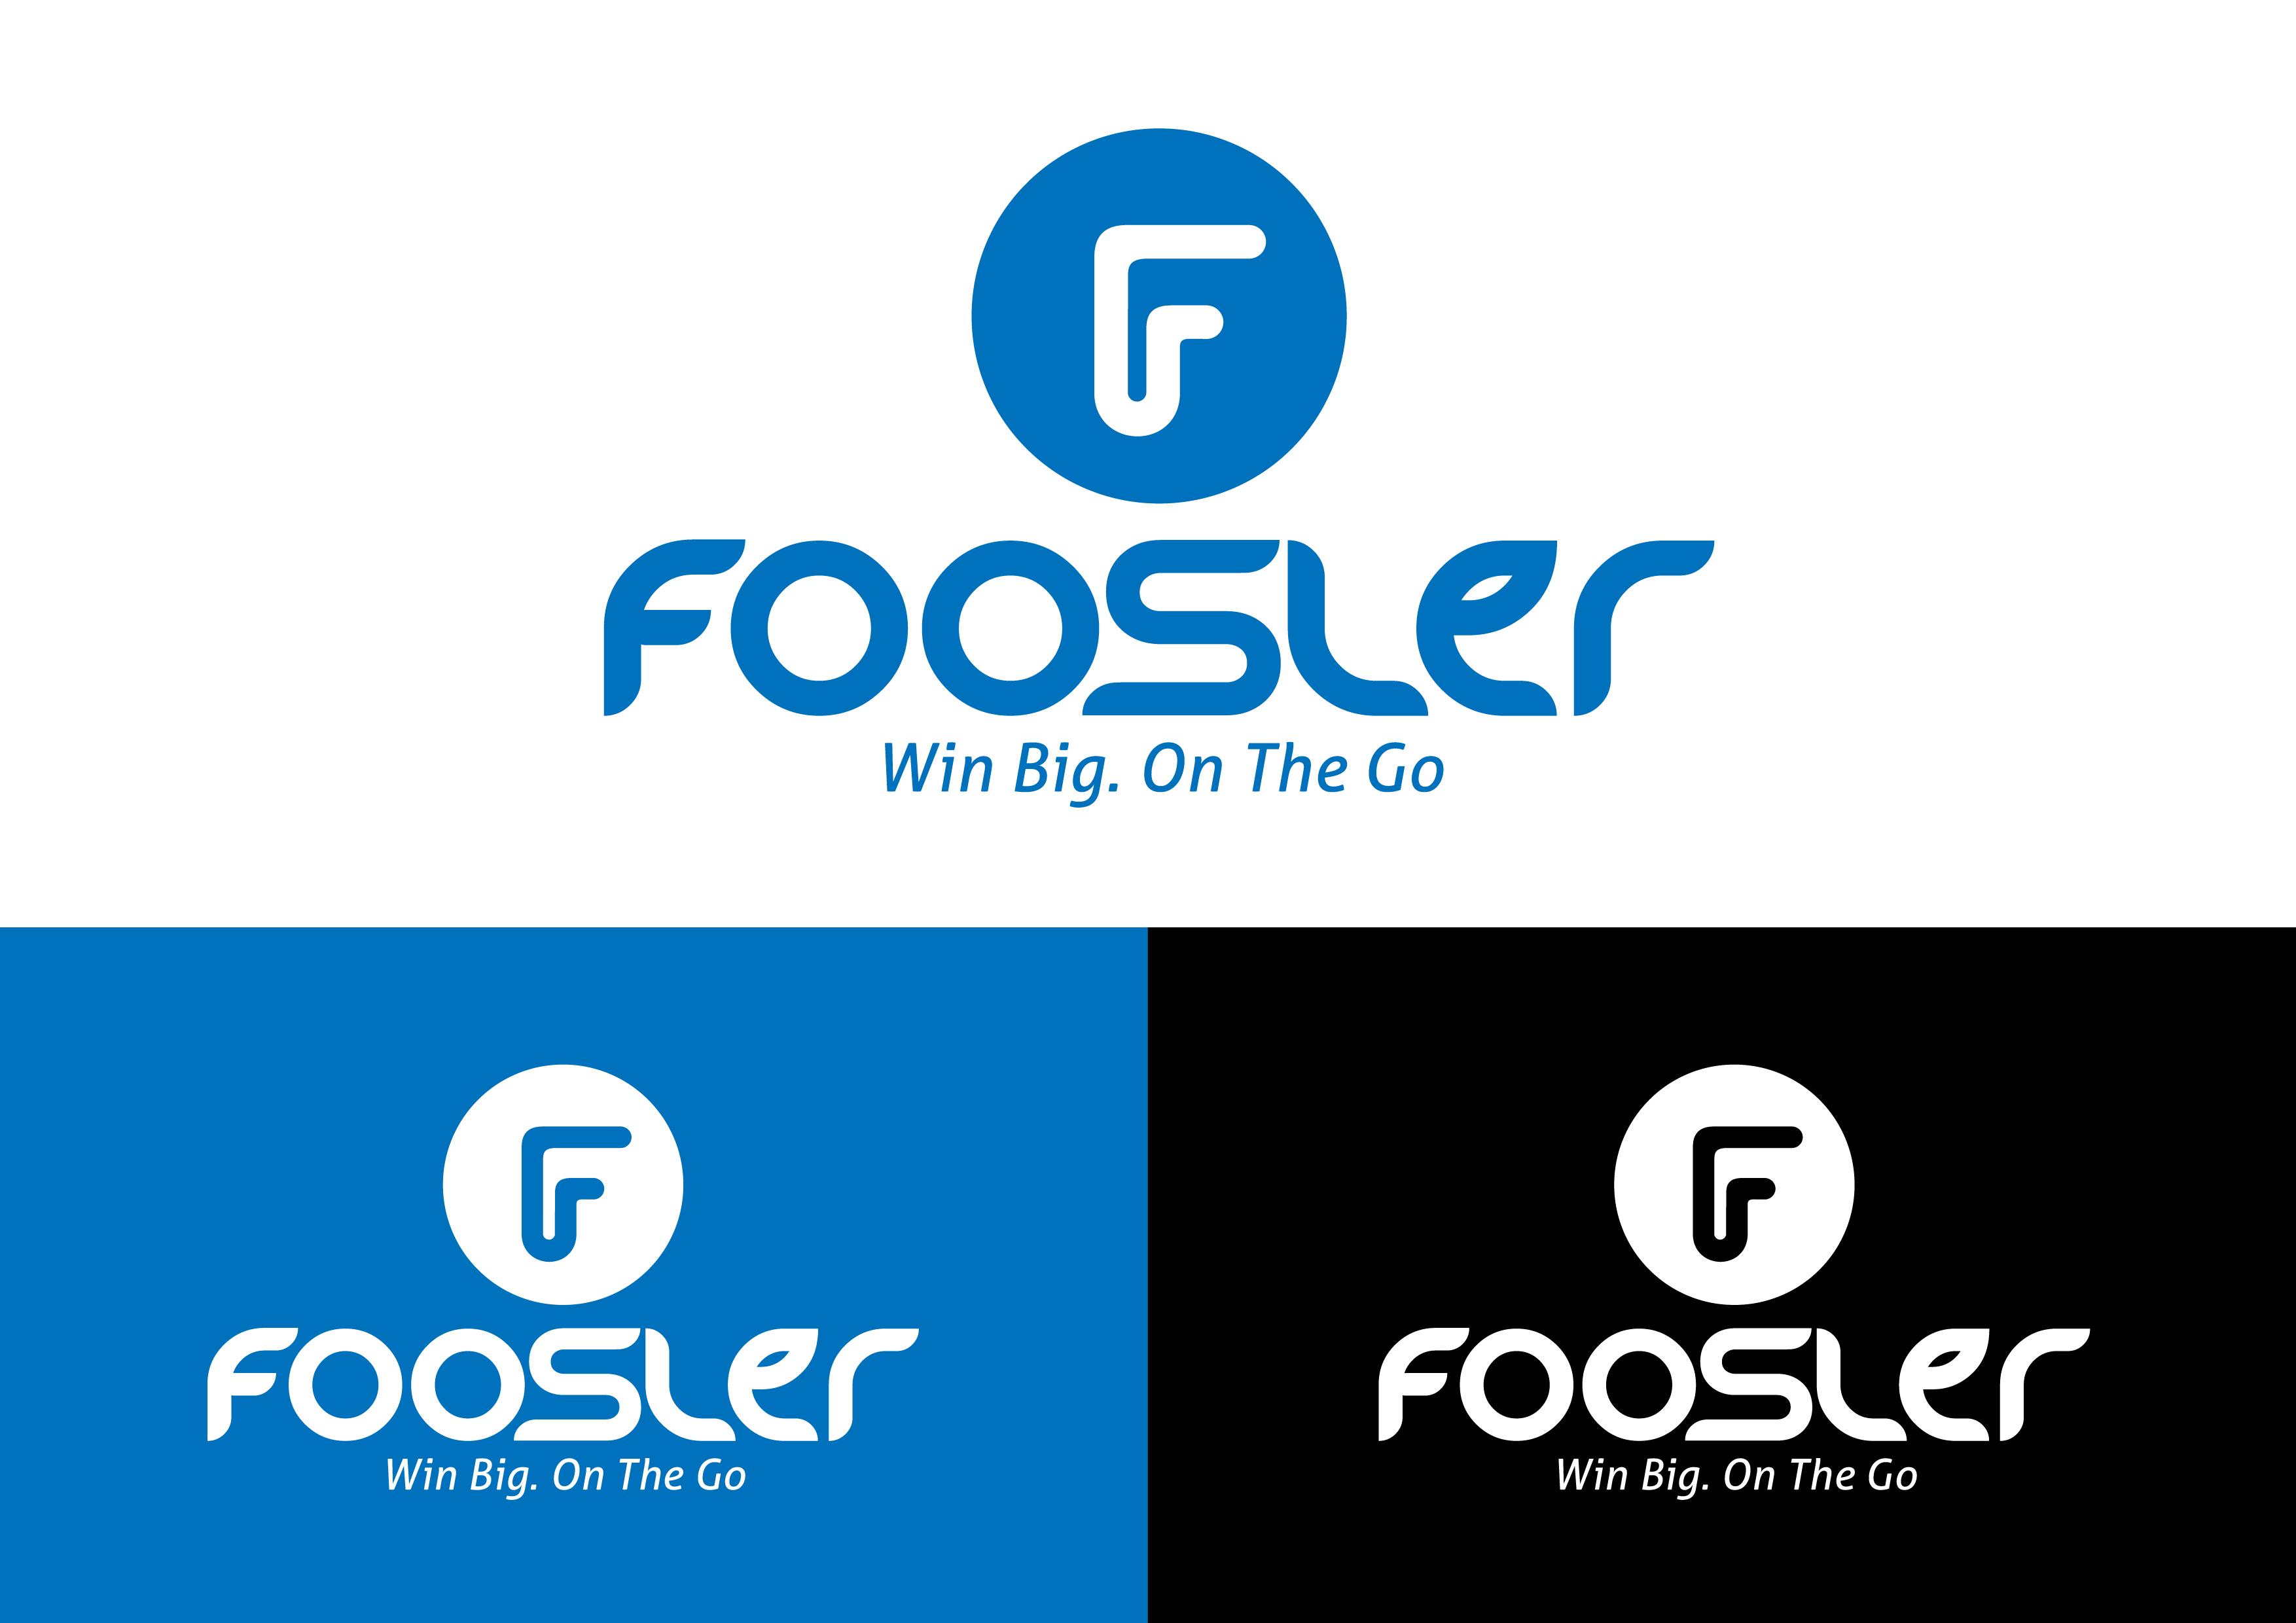 Logo Design by 3draw - Entry No. 117 in the Logo Design Contest Foosler Logo Design.